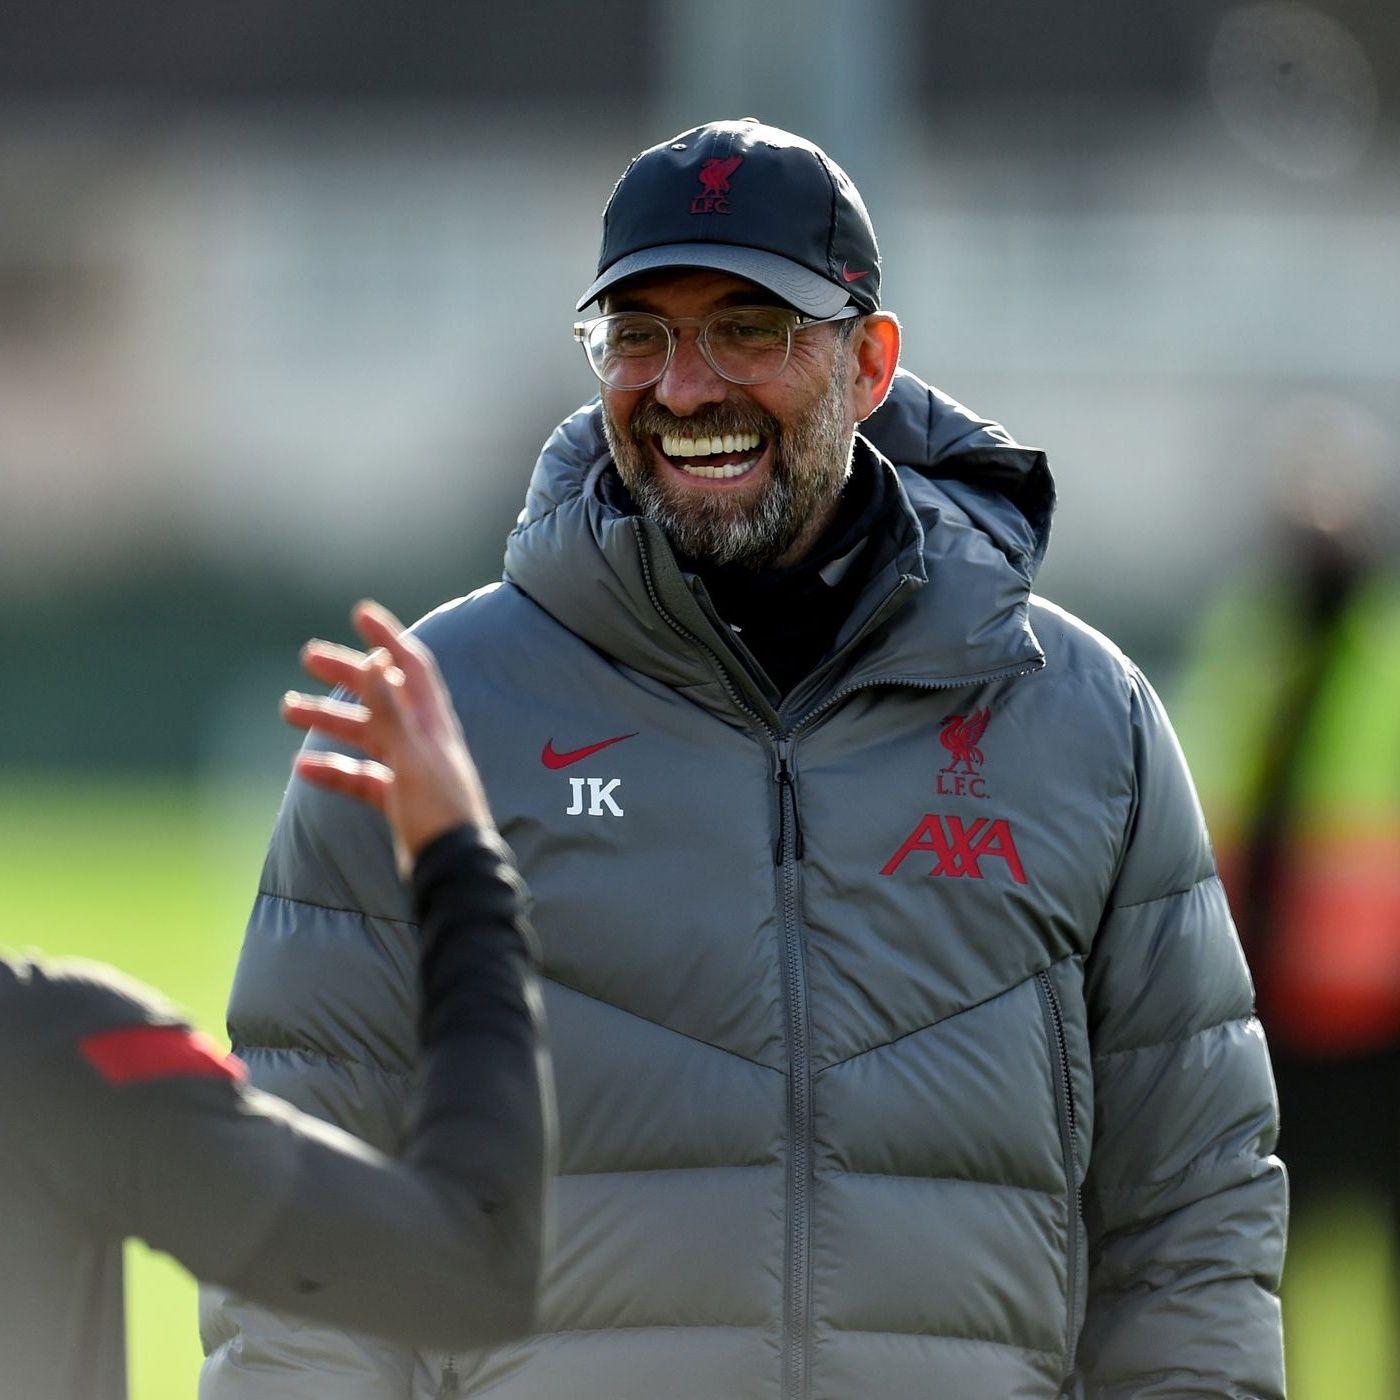 Press conference: Jurgen Klopp previews Merseyside derby | Alisson Becker fitness boost | Mane and Thiago Alcantara set for return